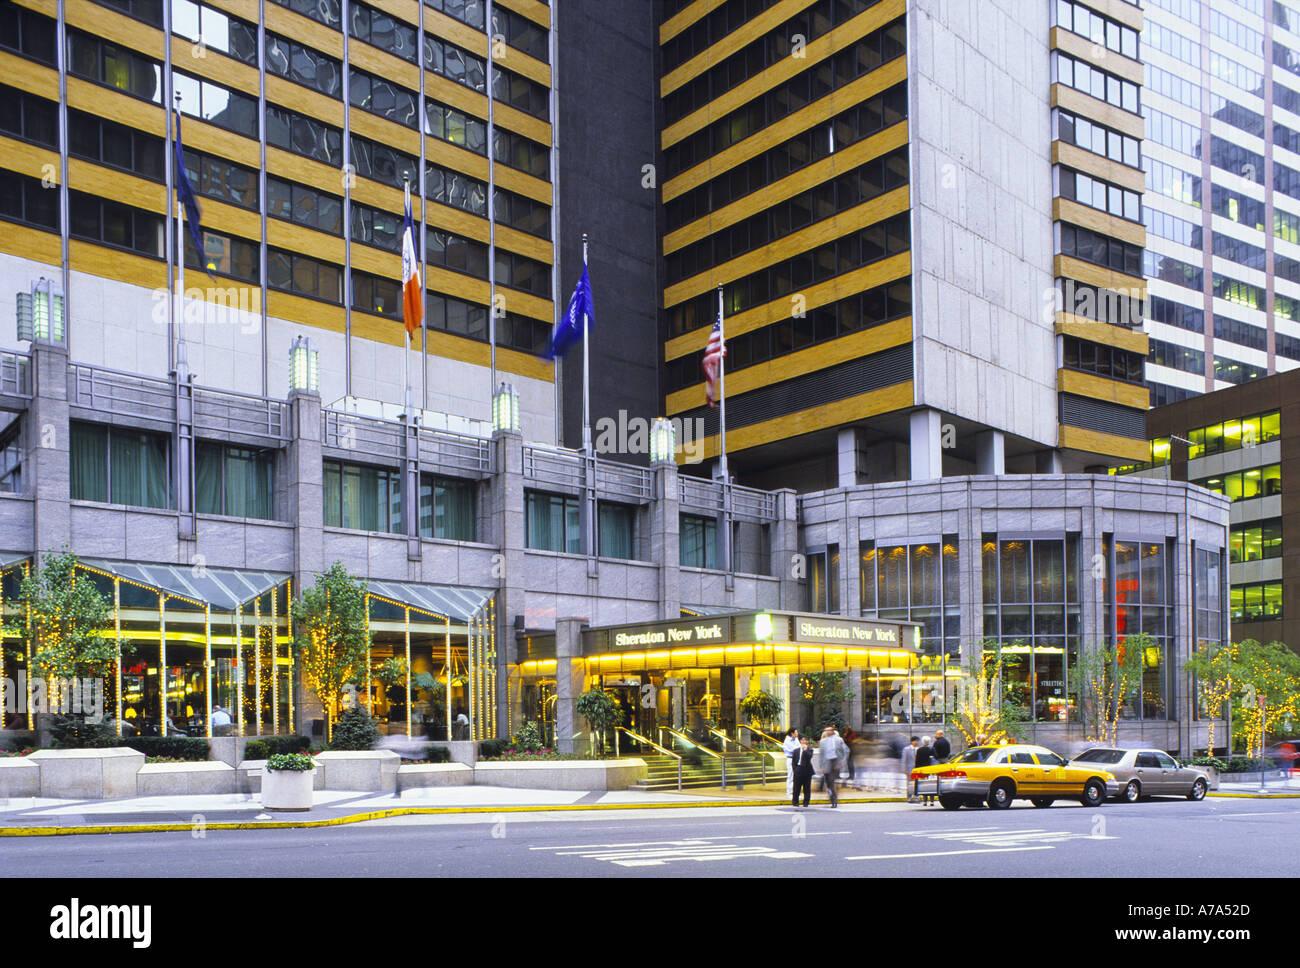 Sheraton Hotels New York State